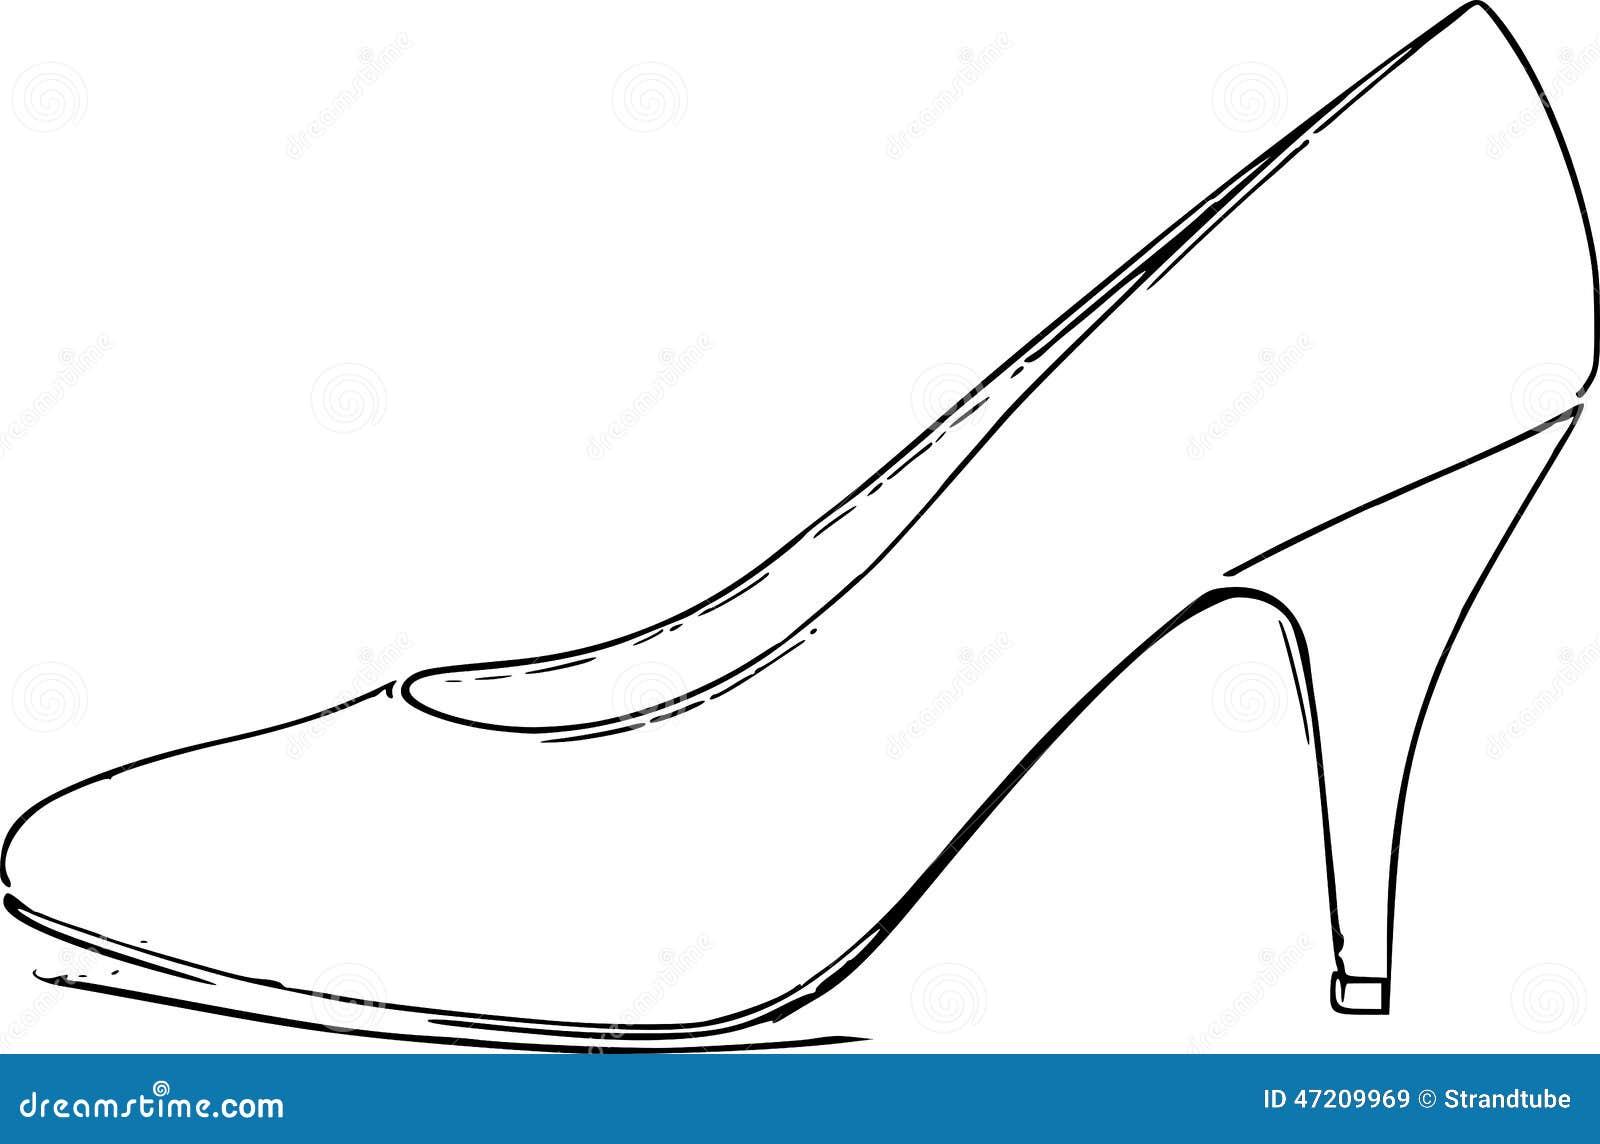 Line Art Shoes : Royalty free stock images high heel shoe line art sketch